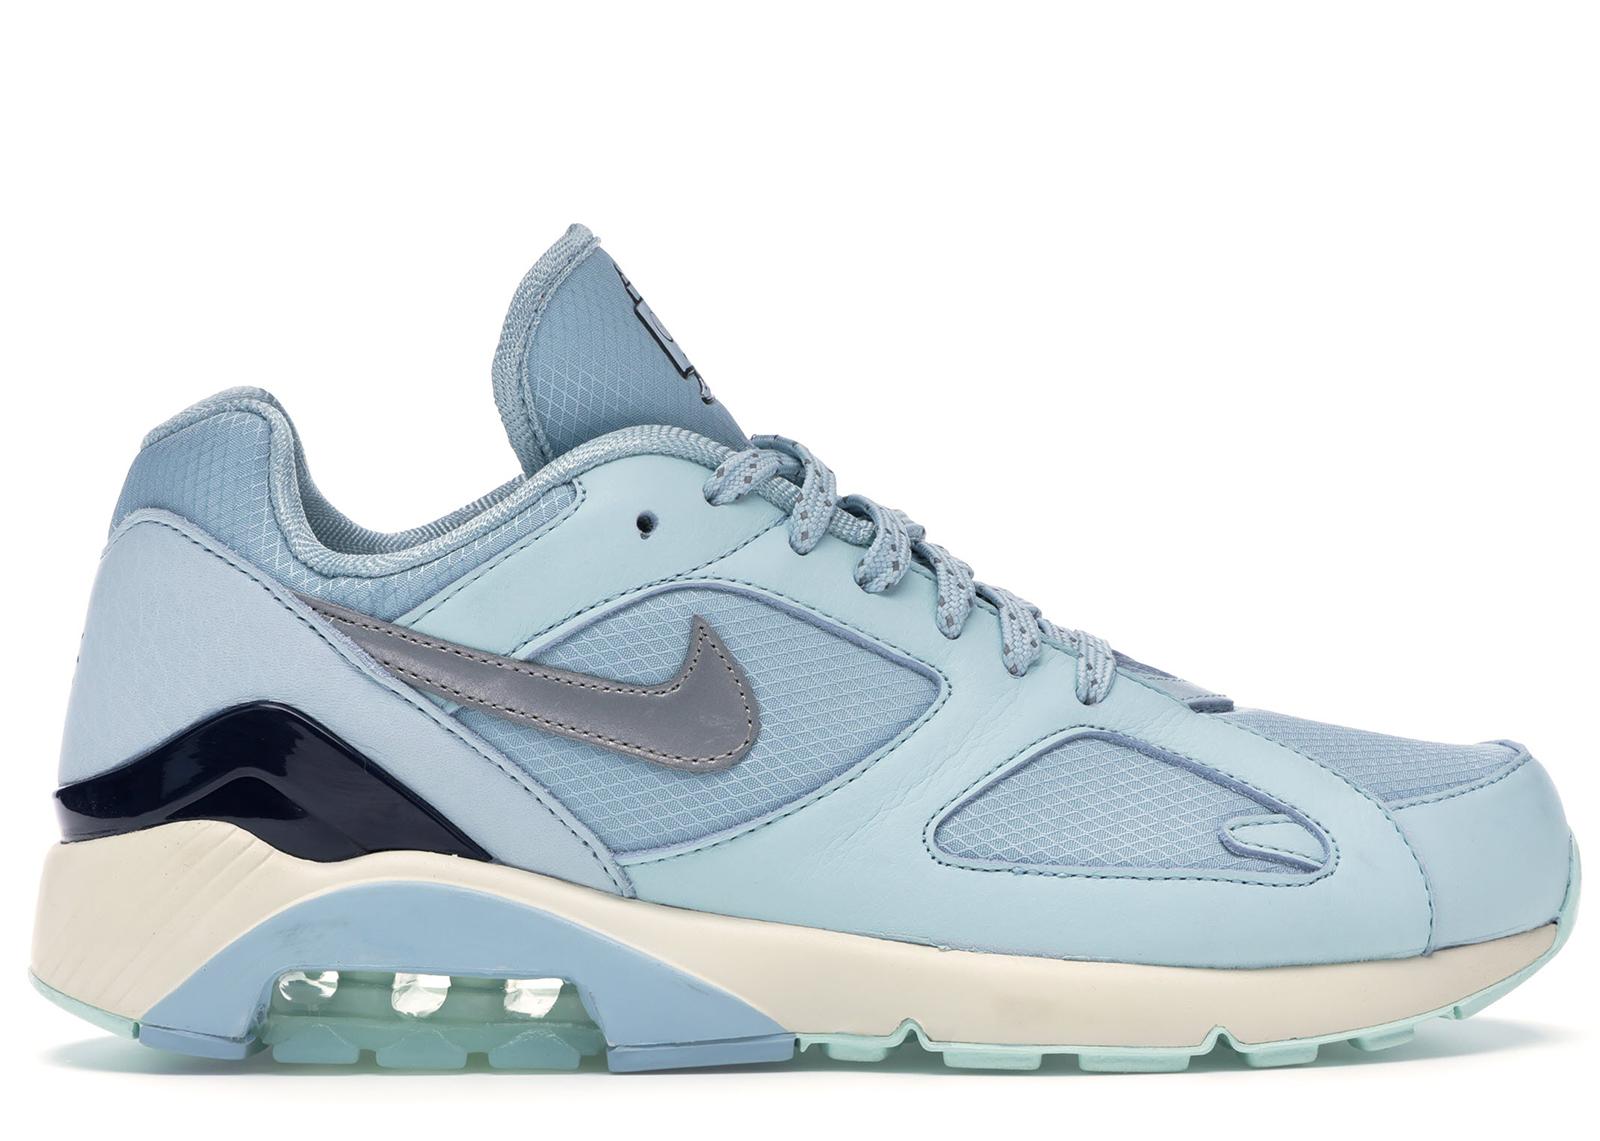 Nike Air Max 180 Ice